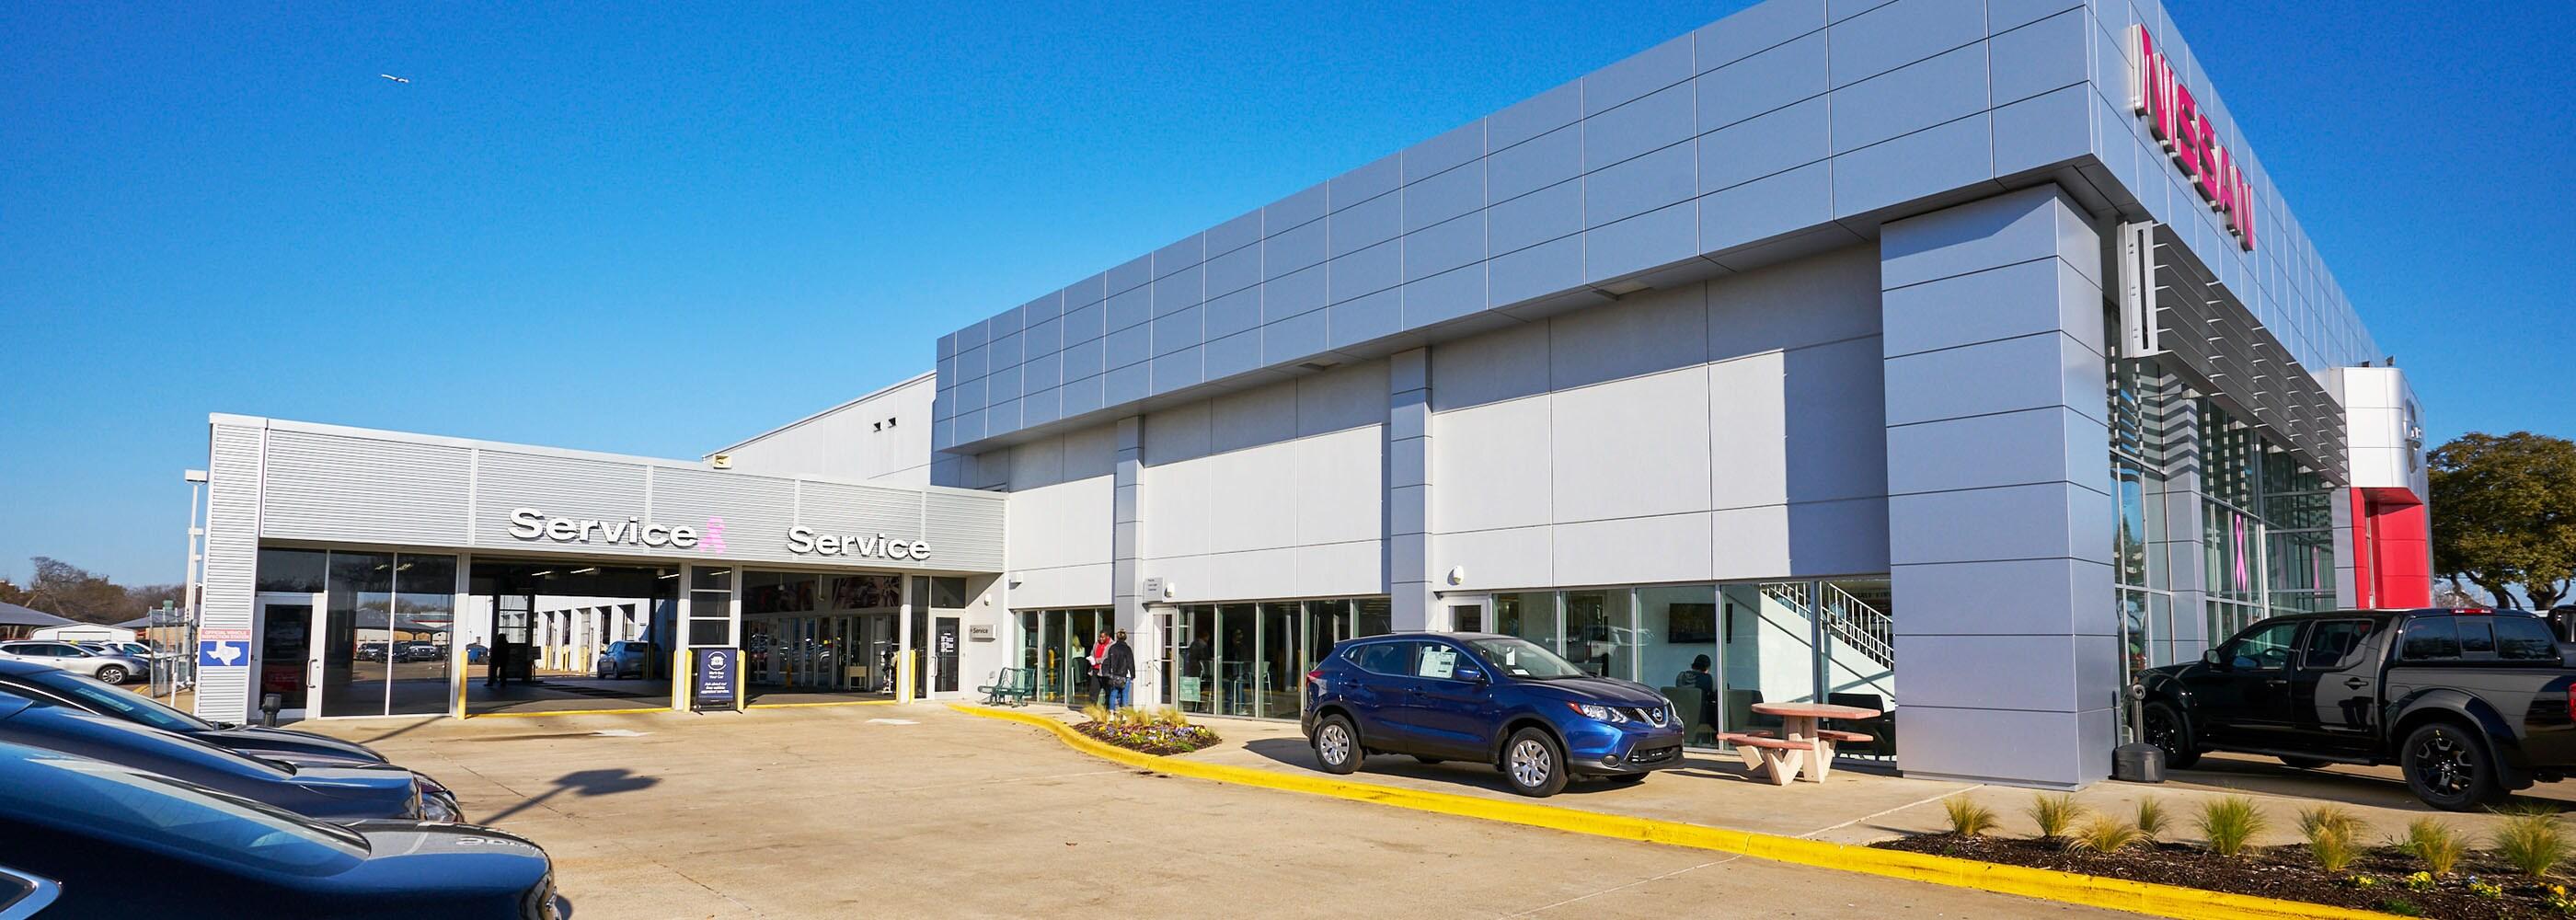 Autonation Nissan Lewisville Nissan Service Center